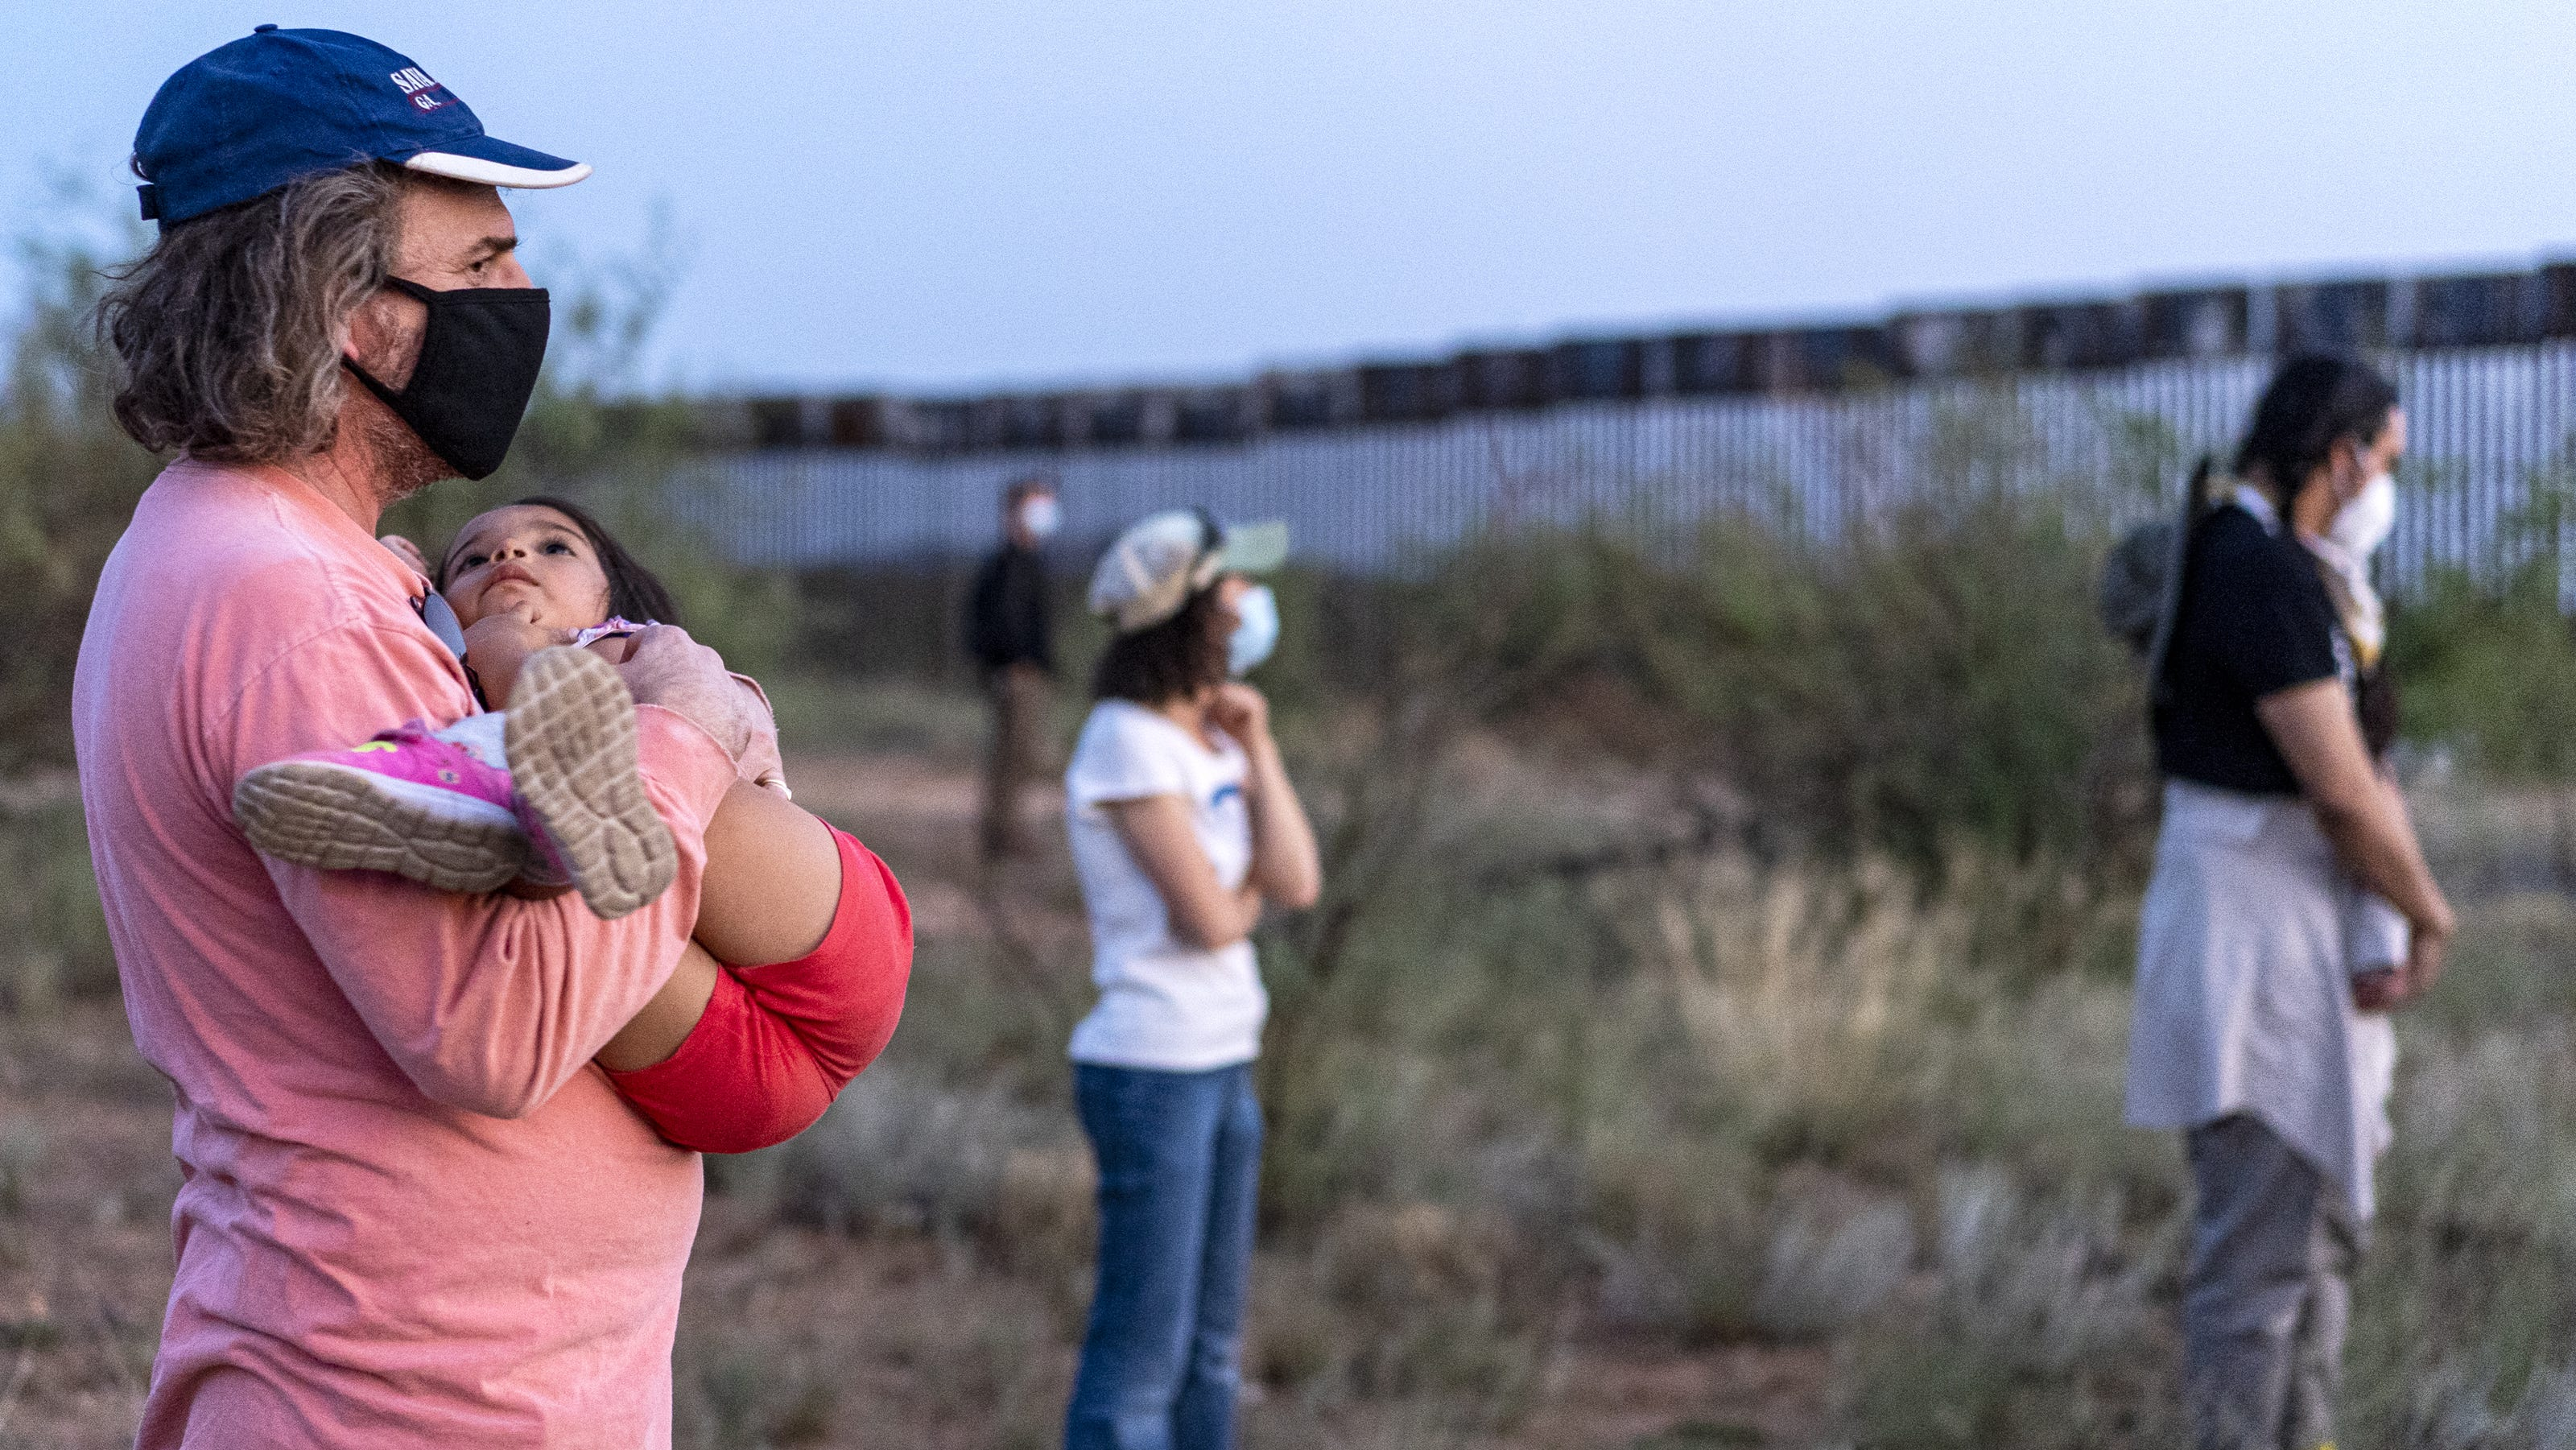 Interfaith groups use prayer vigils in weeklong protest of border wall construction